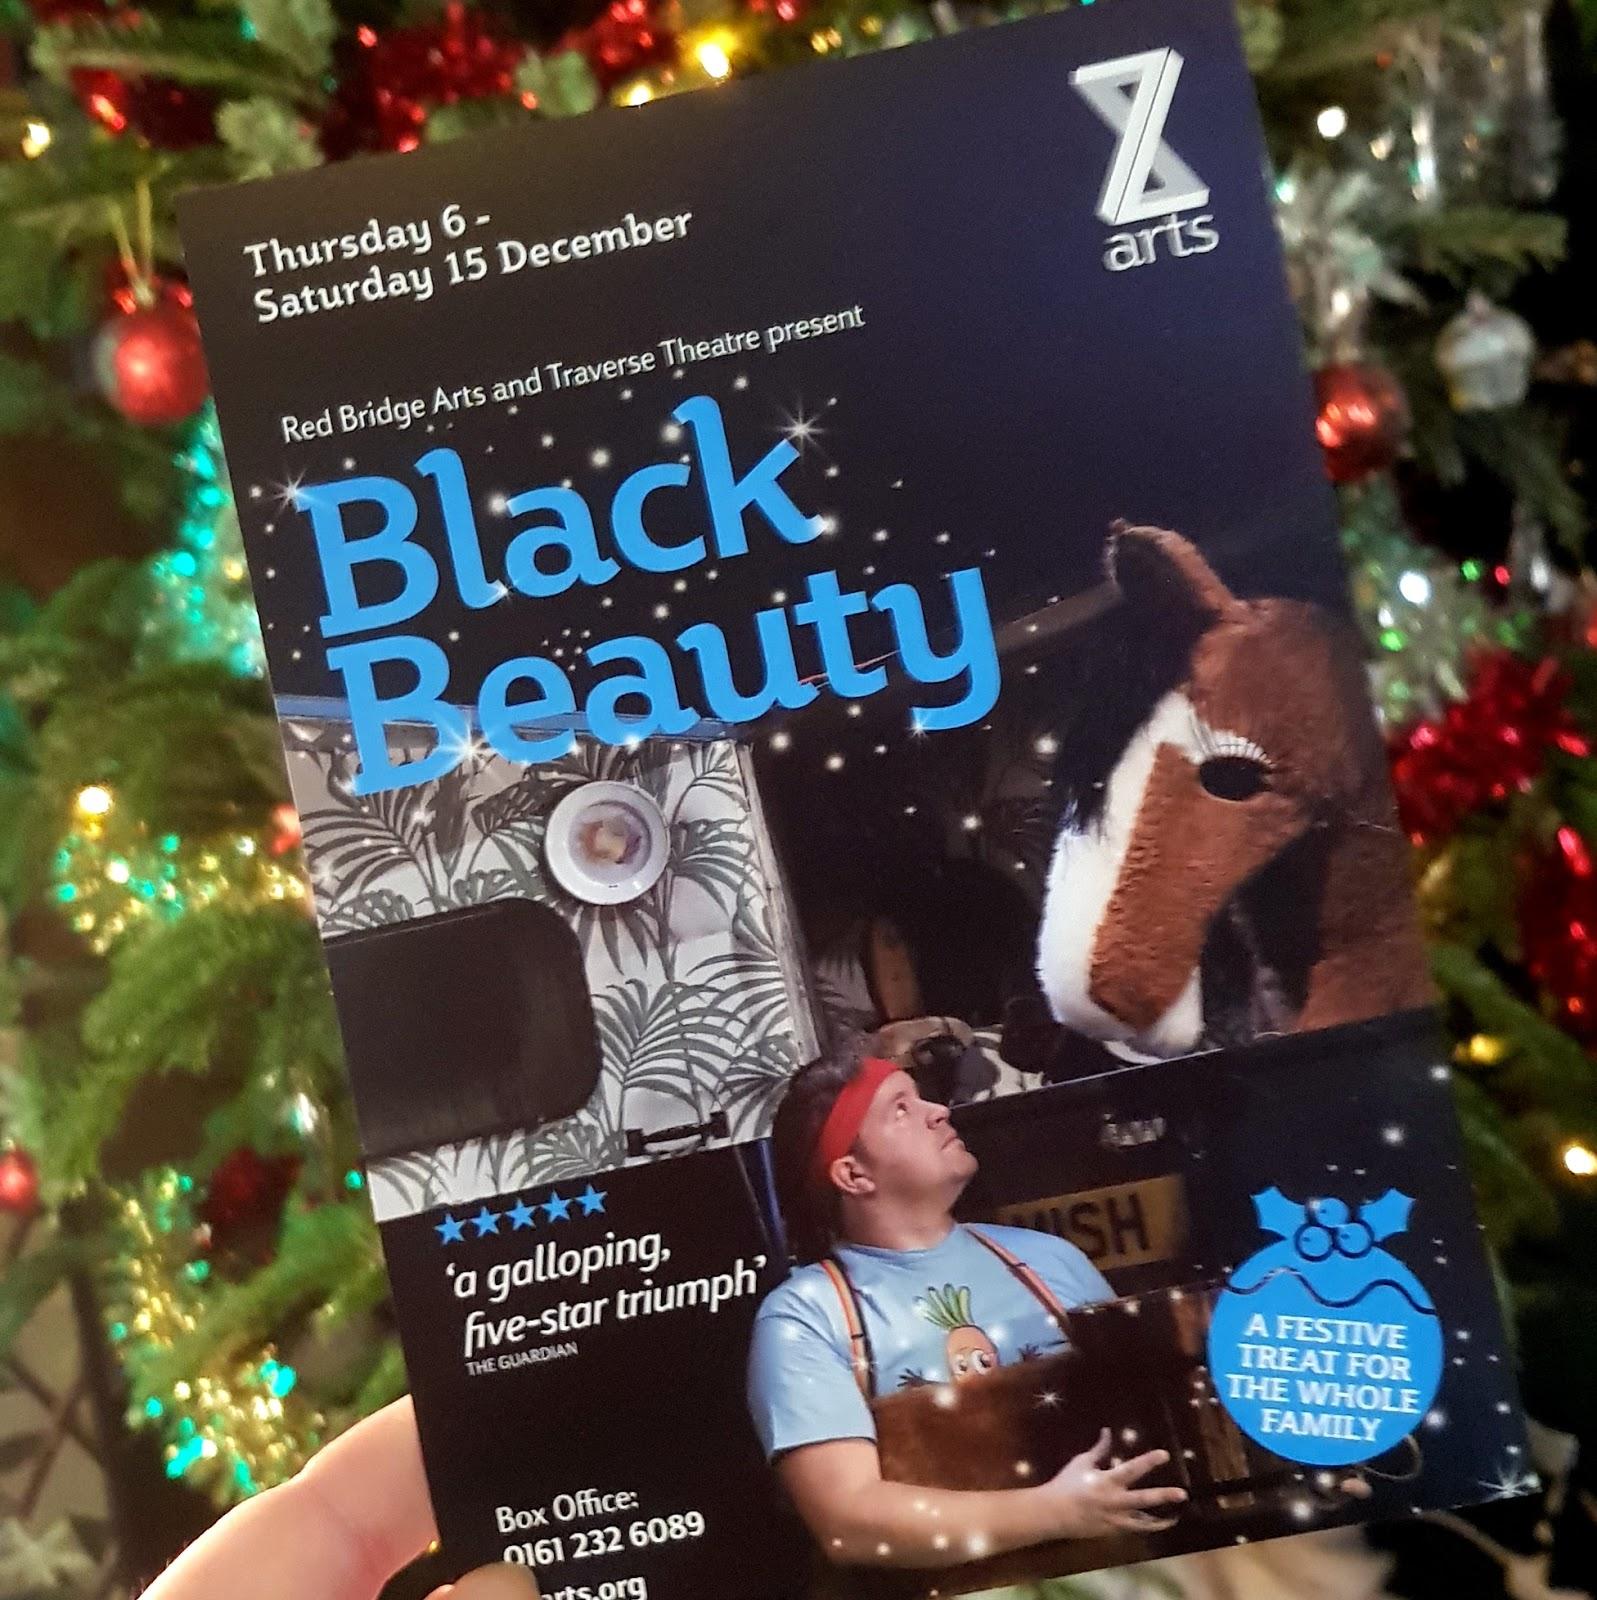 3ec226eb033 The Brick Castle  Black Beauty At Z-Arts